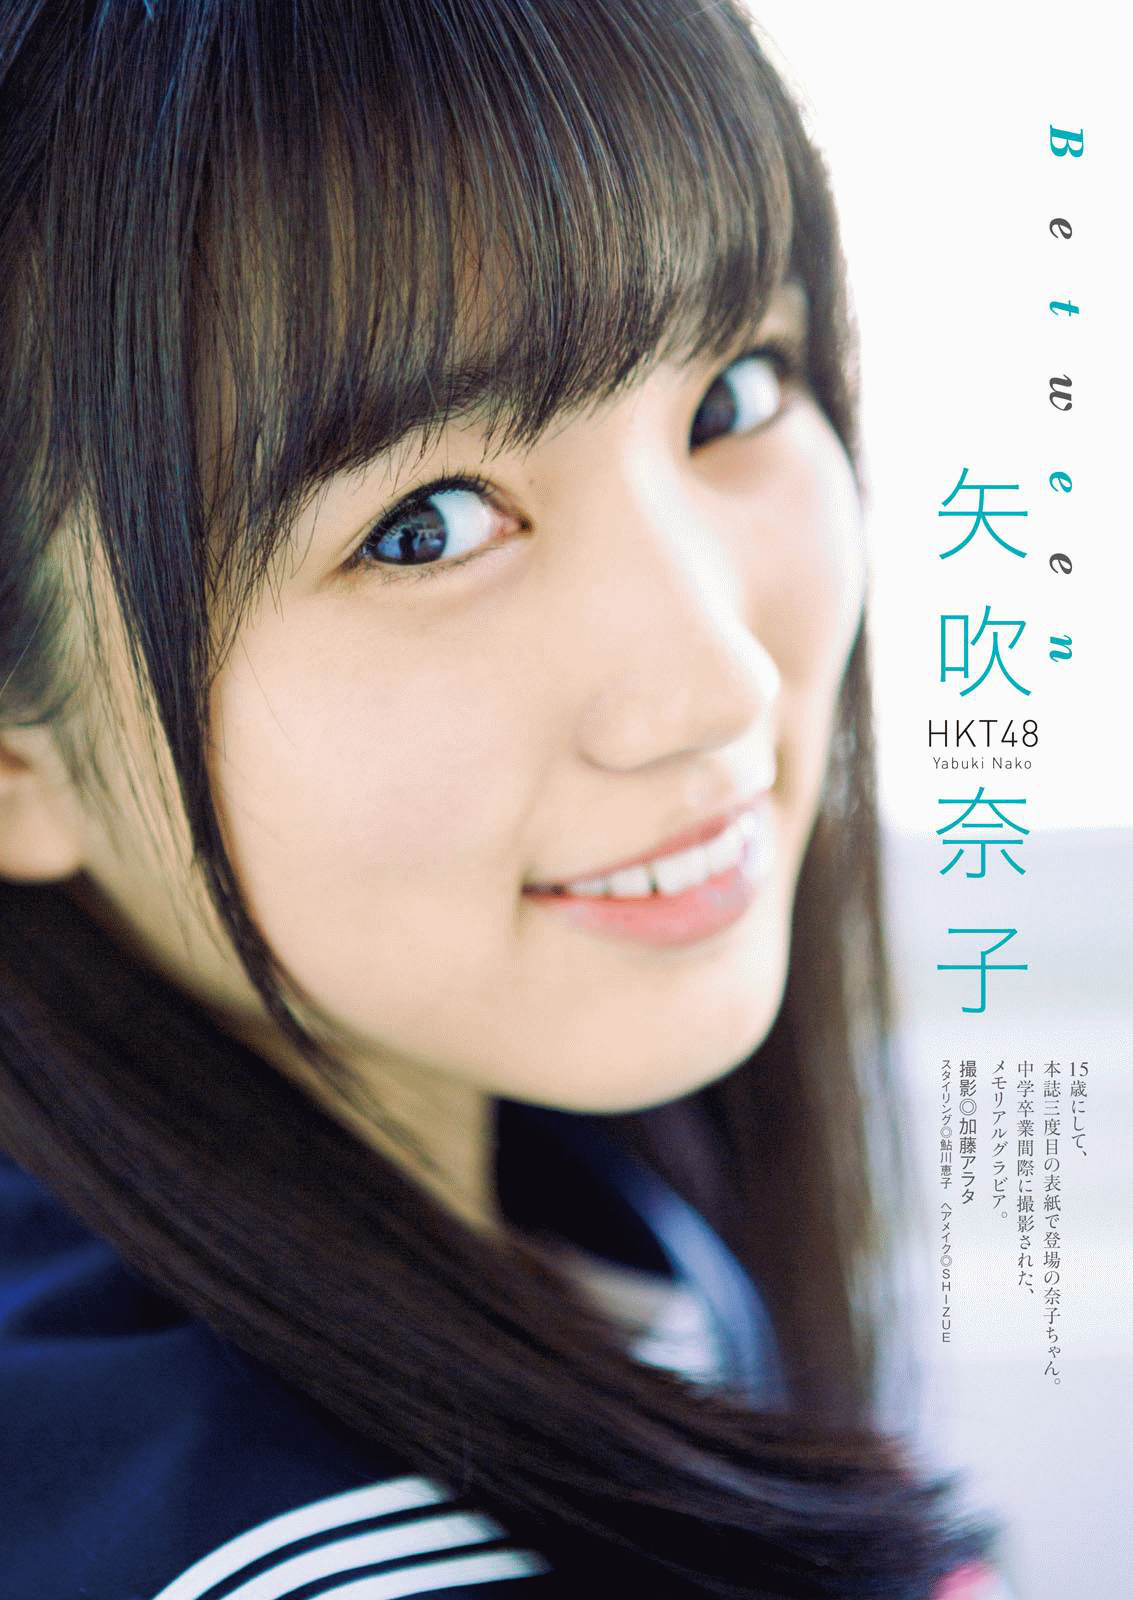 HKT48矢吹奈子(16)の胸チラ、水着グラビアエロ画像34枚・12枚目の画像